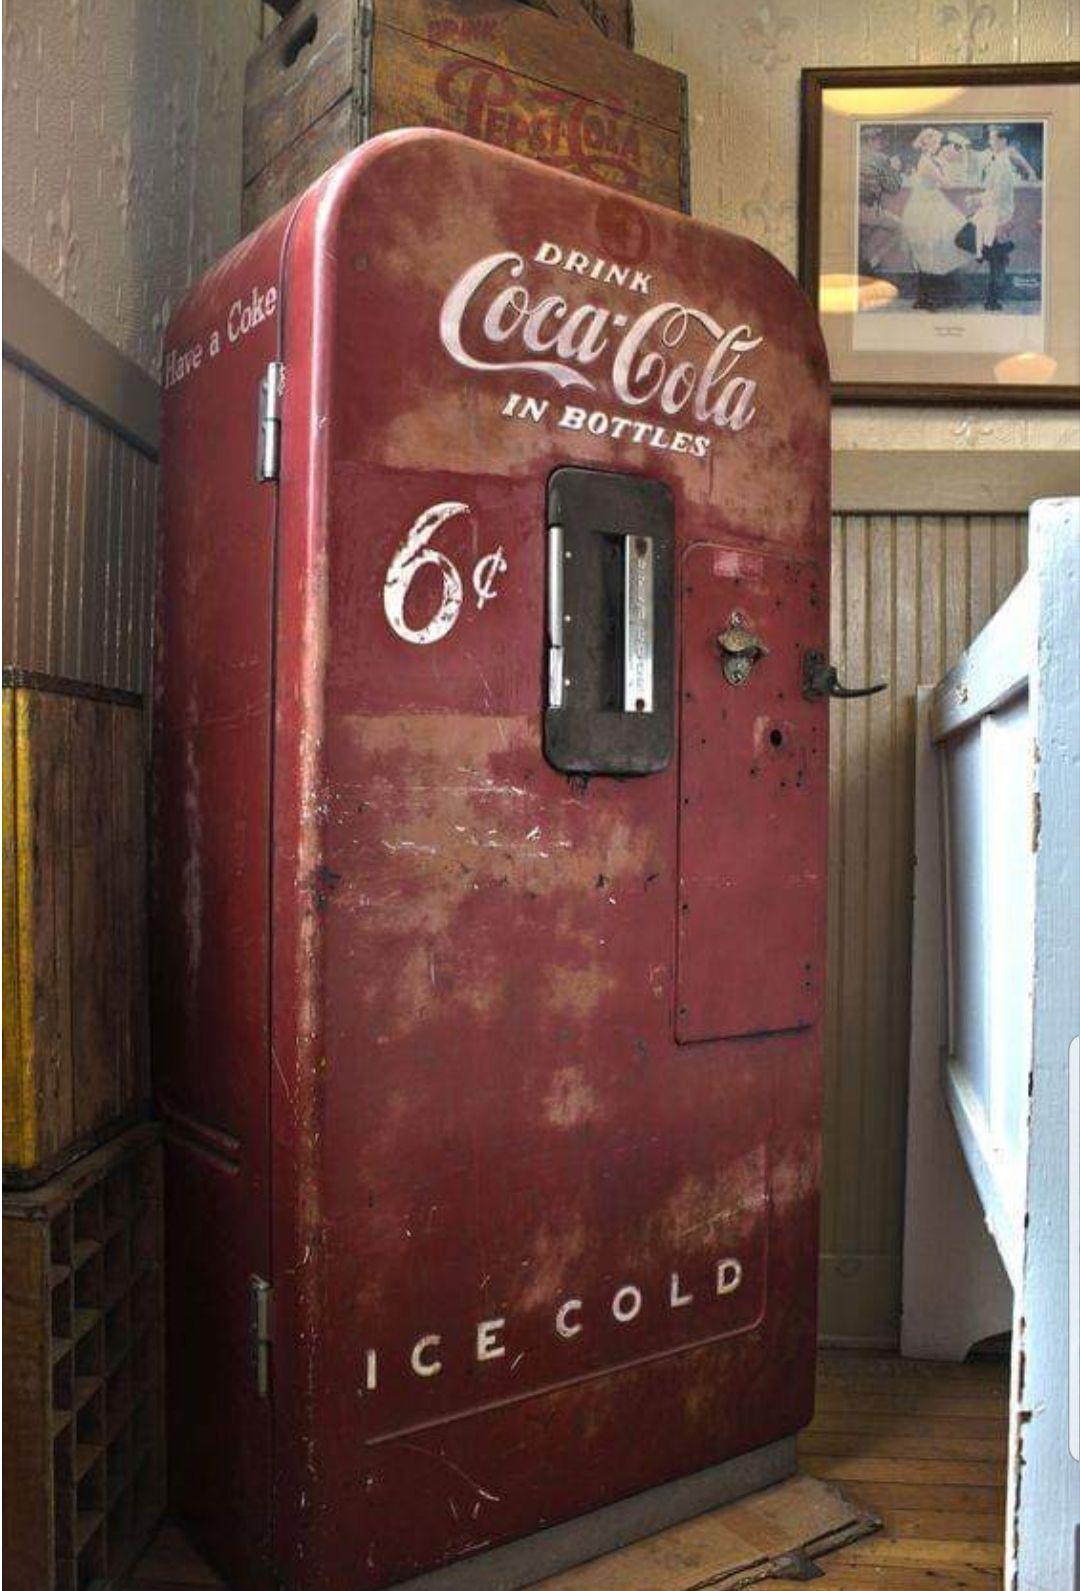 Pin on Enjoy...Coca~Cola